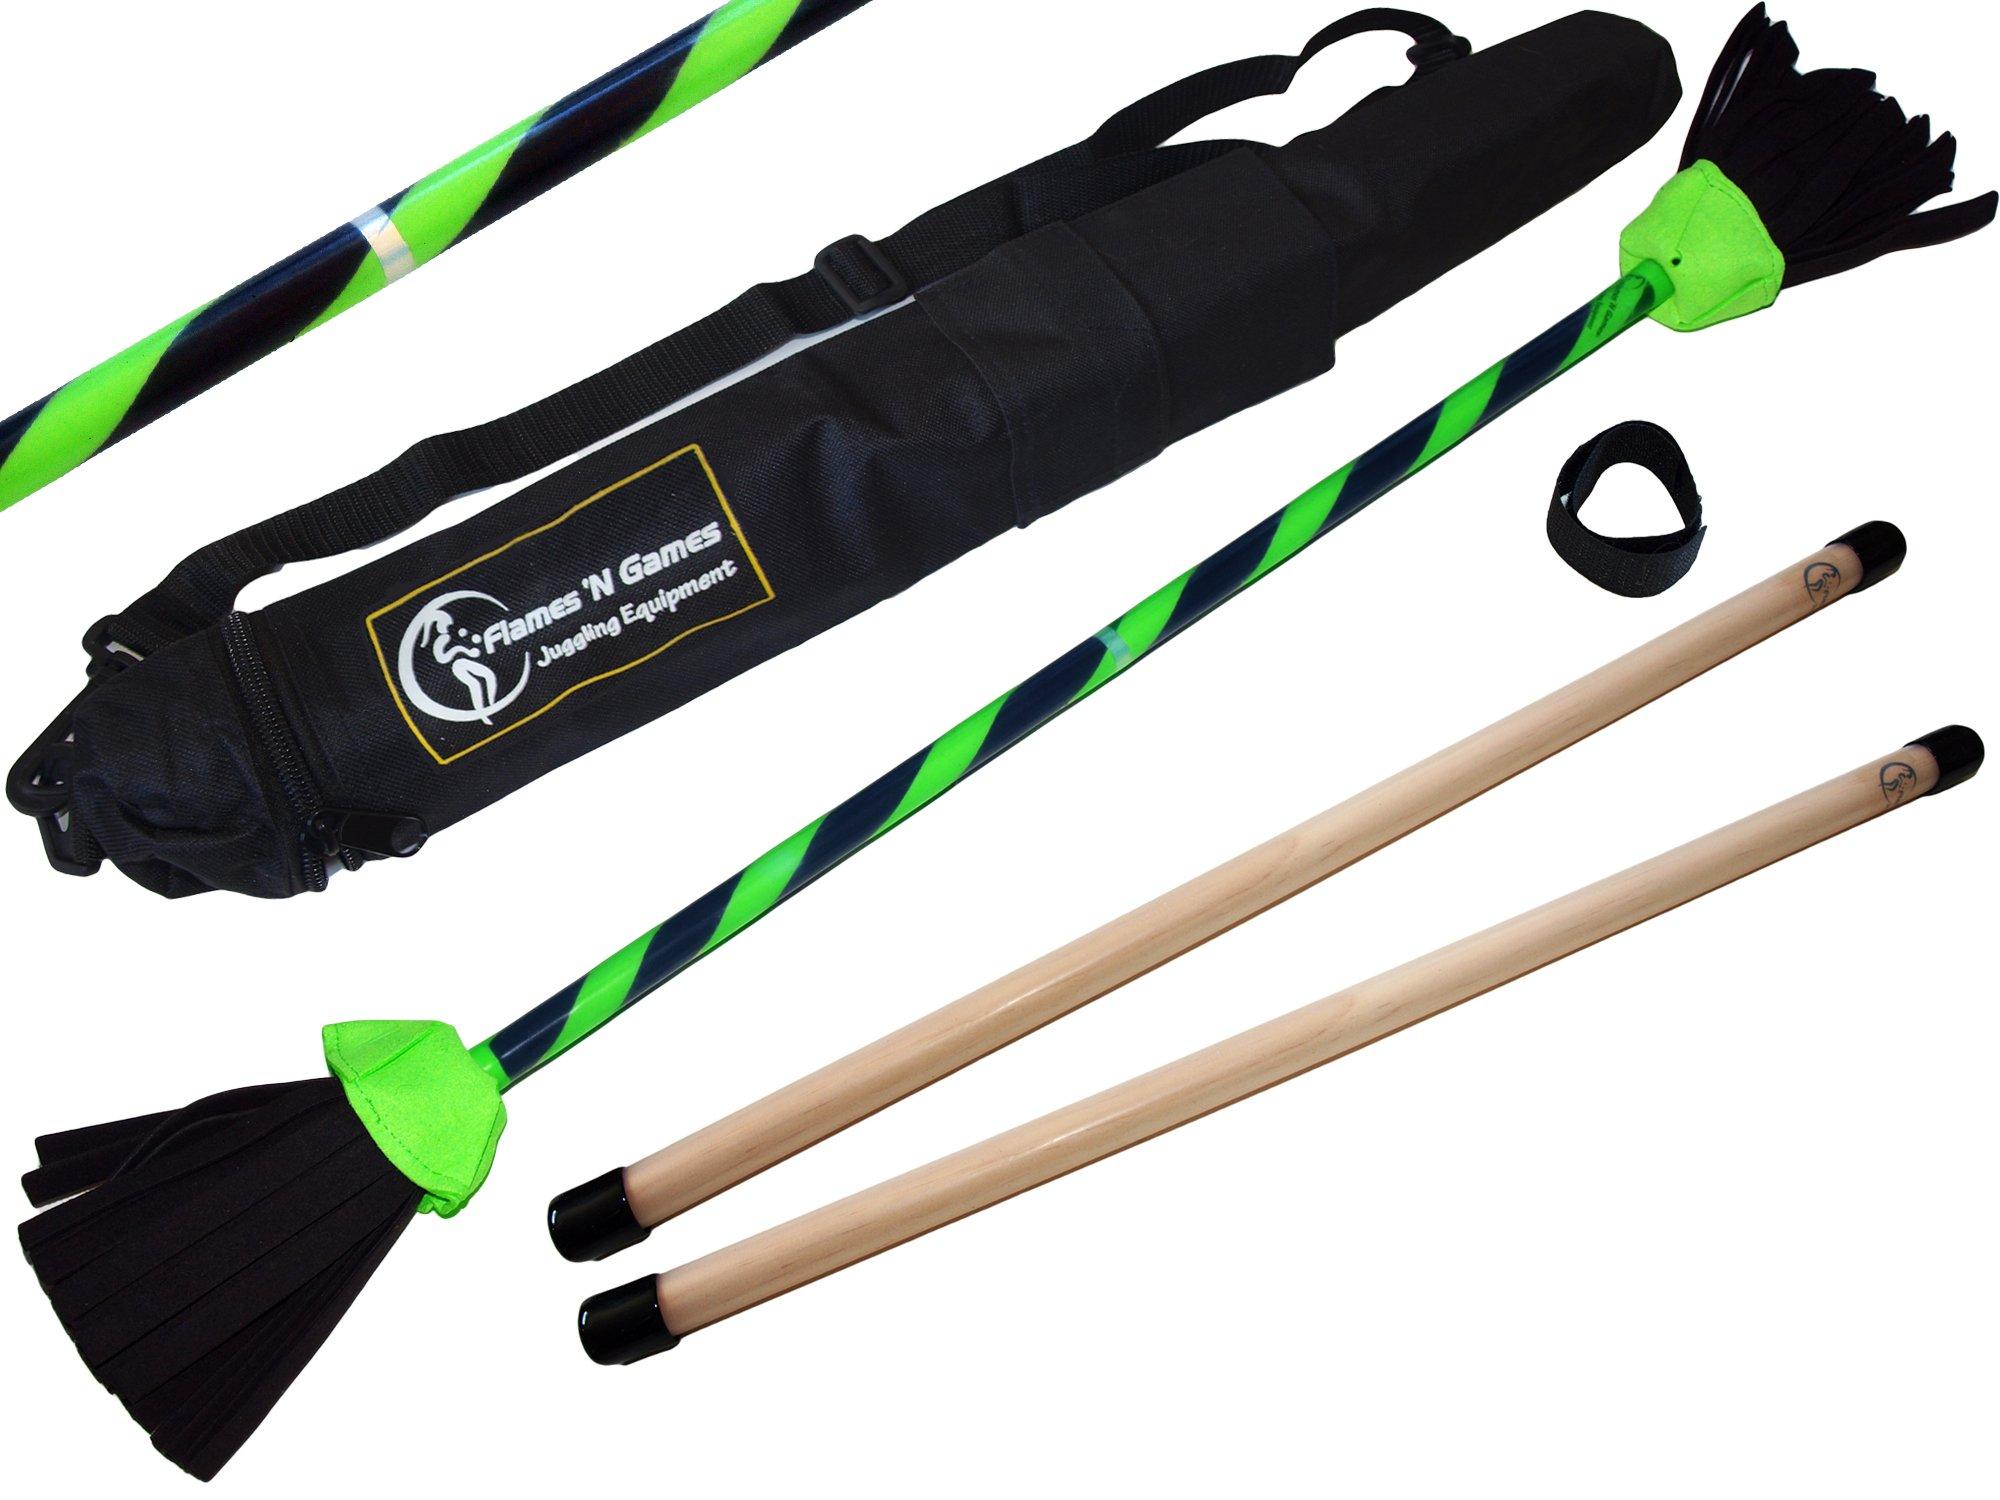 Flames N Games FLASH Flowerstick Set (UV Grip Deco) Silicone WOODEN Handsticks! Ultra Strong Fibreglass core + Travel Bag! Ideal For Beginners & Pros! (Green)